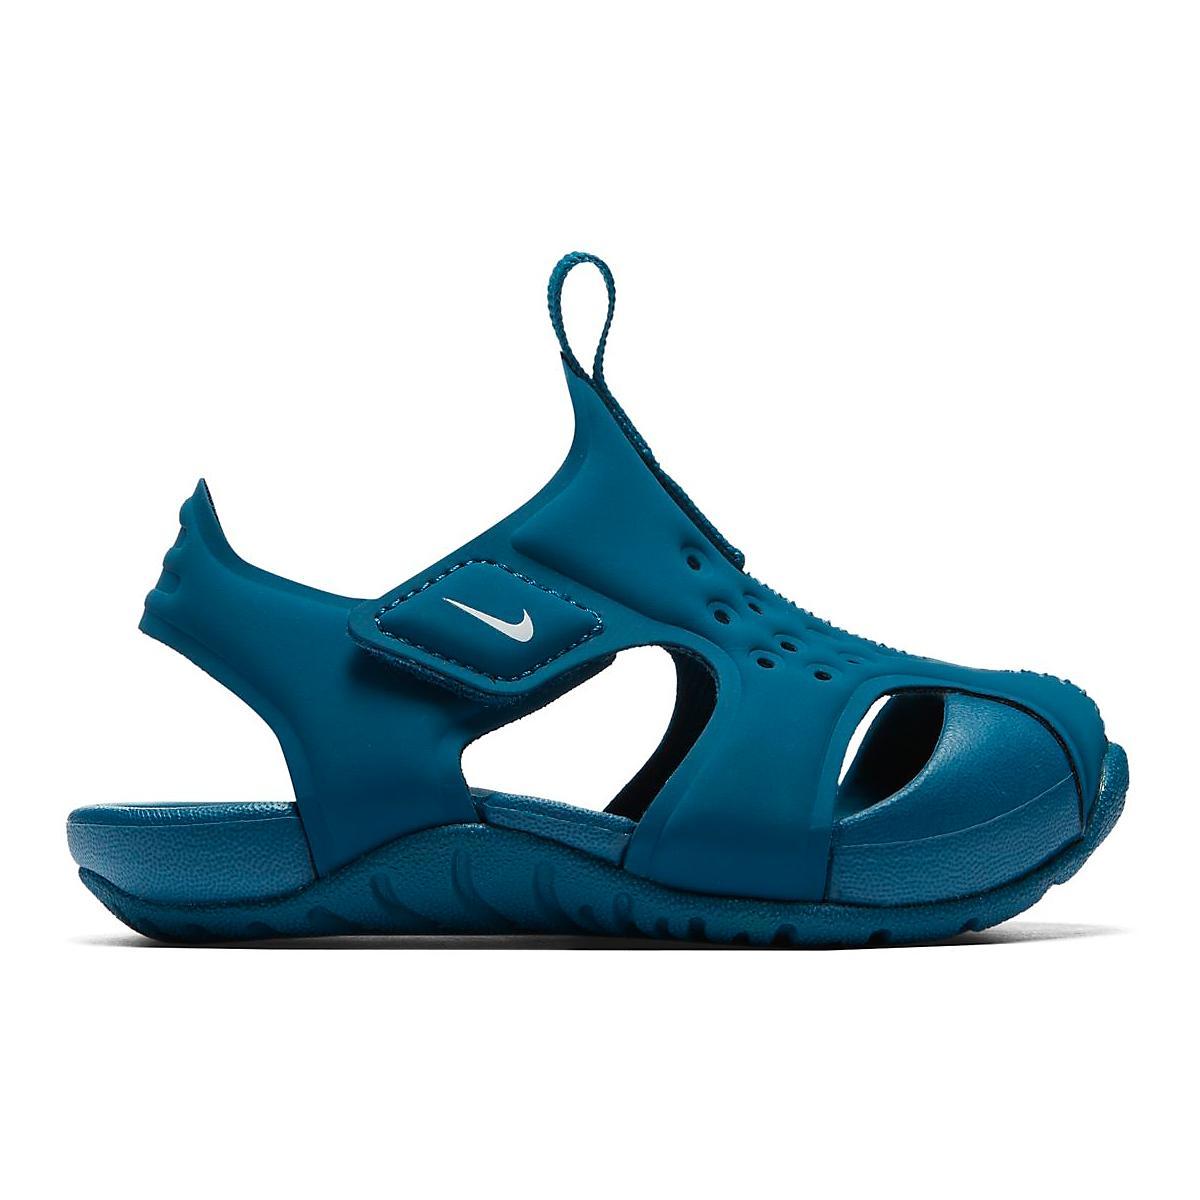 promo code ac374 efb8a Kids Nike Sunray Protect 2 Sandals Shoe